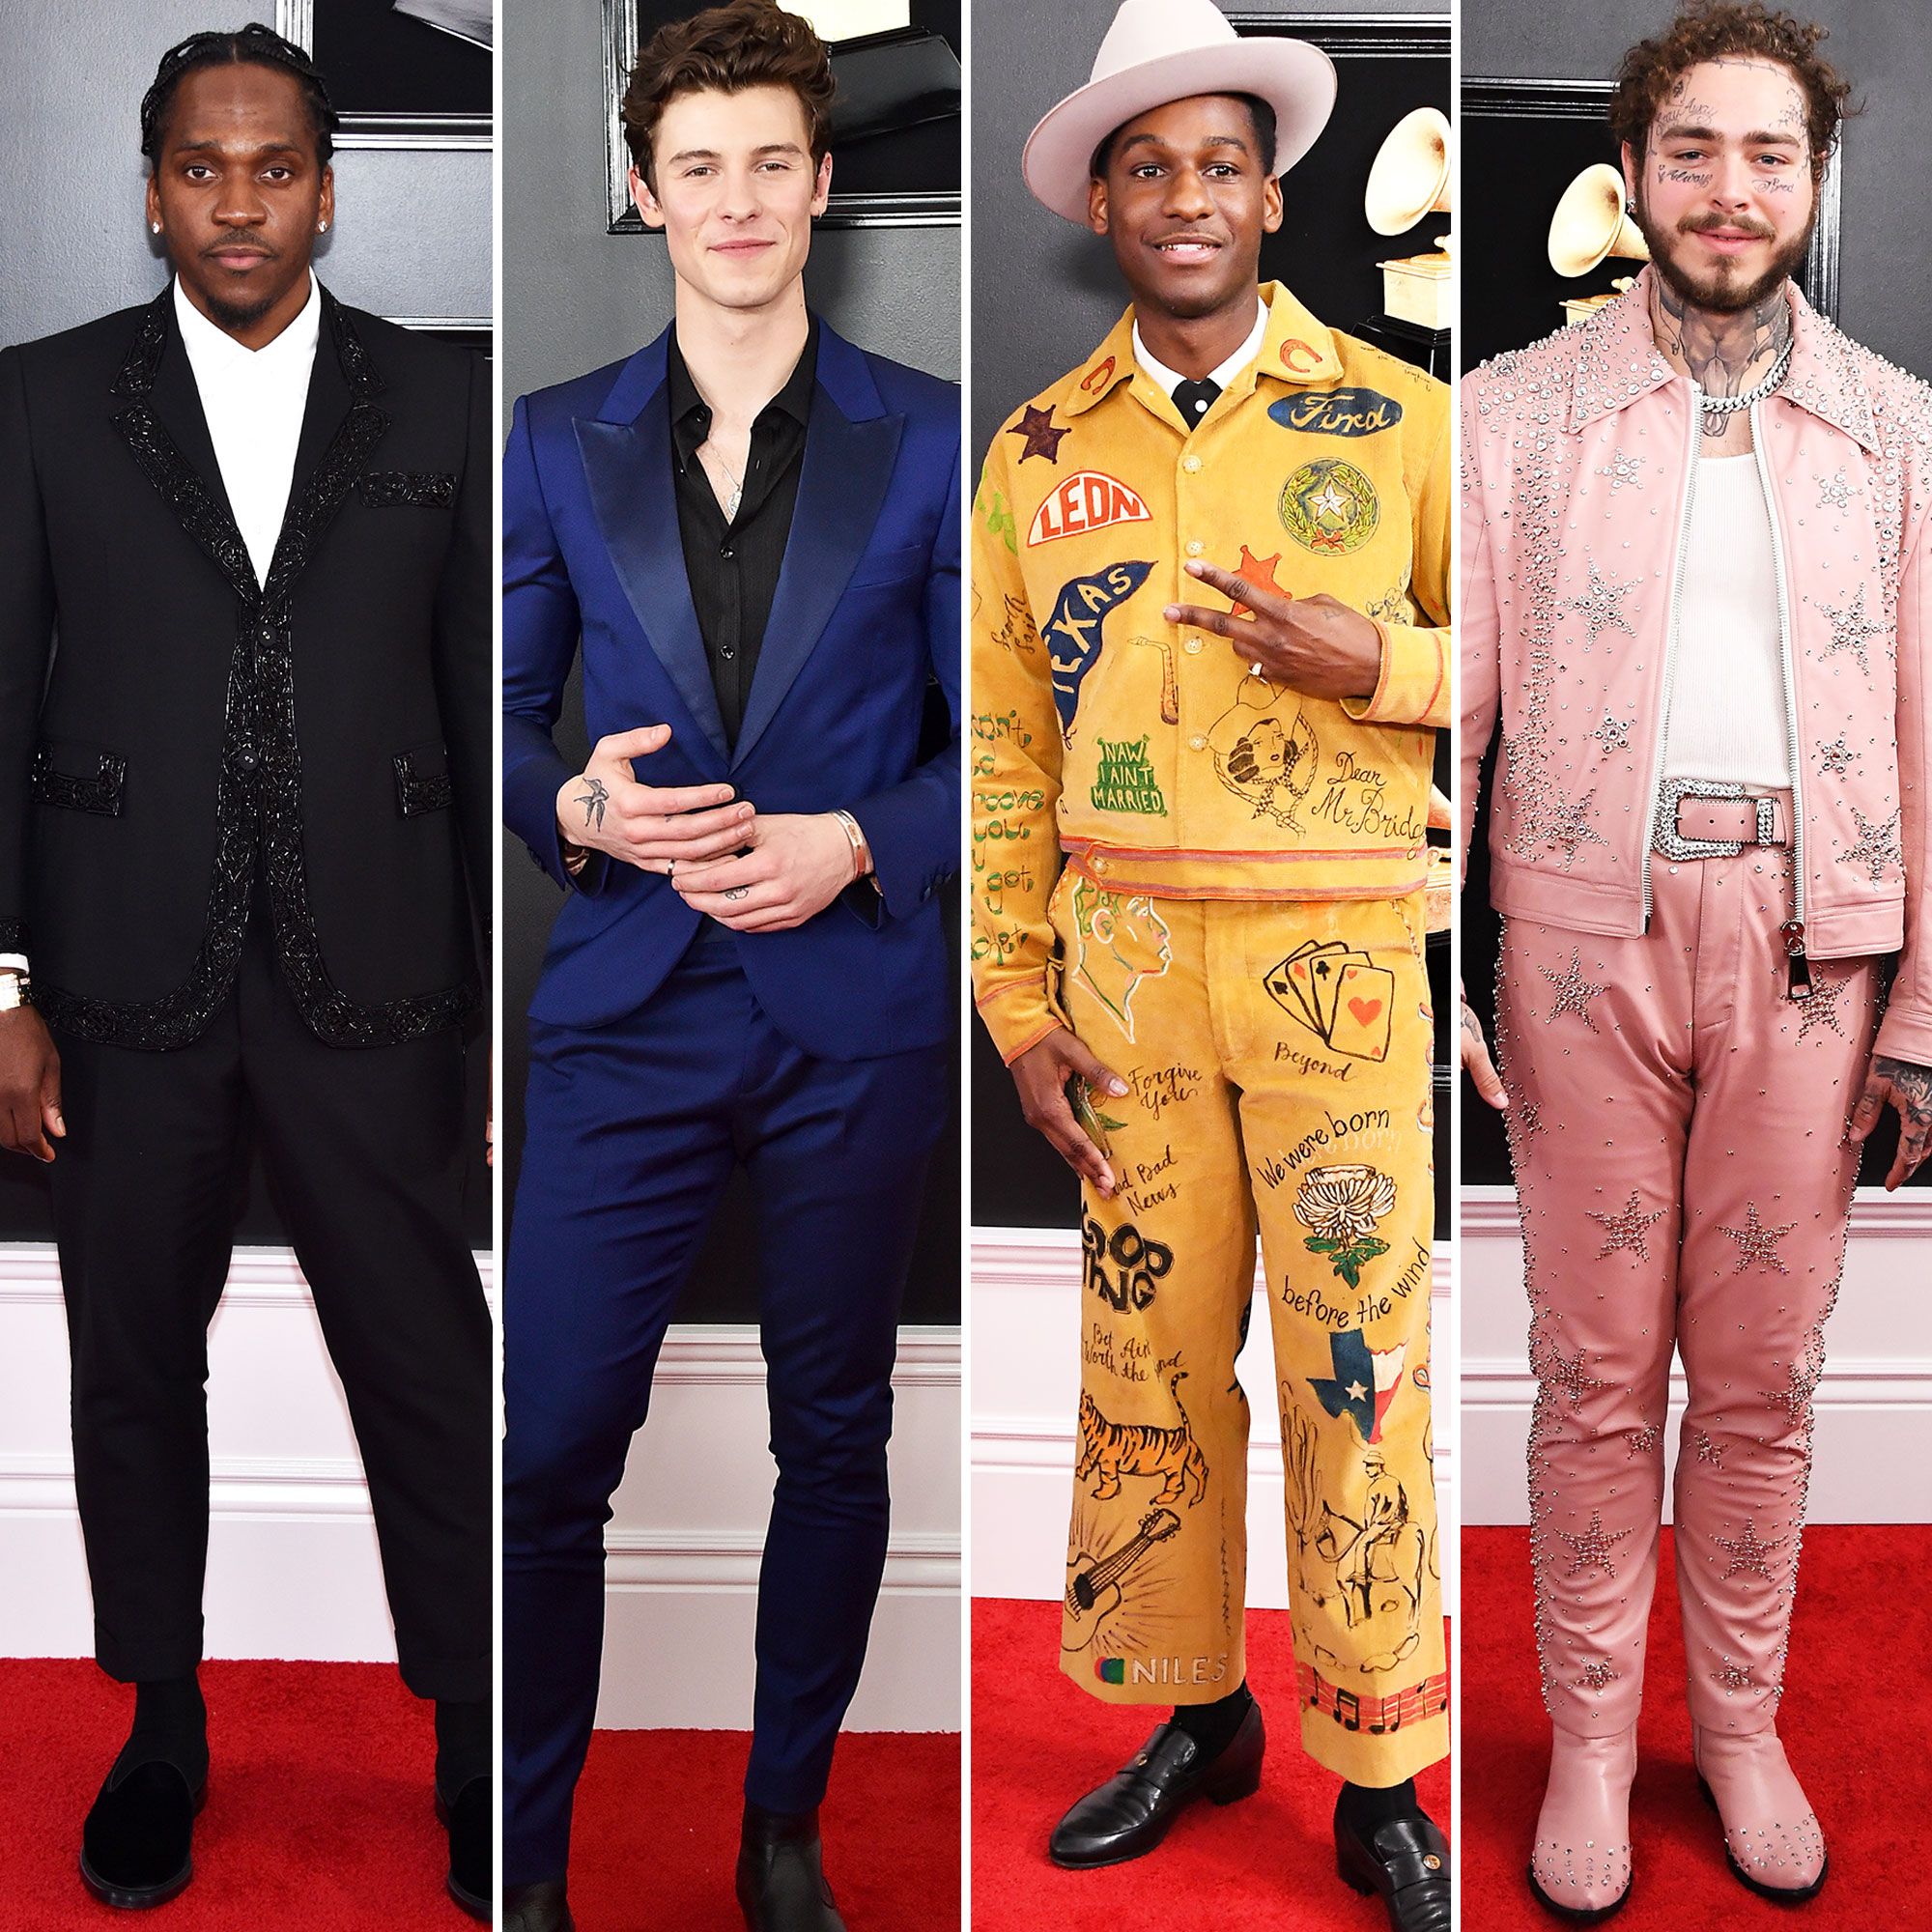 Pusha T, Shawn Mendes, Leon Bridges and Post Malone grammys 2019 - Pusha T, Shawn Mendes, Leon Bridges and Post Malone